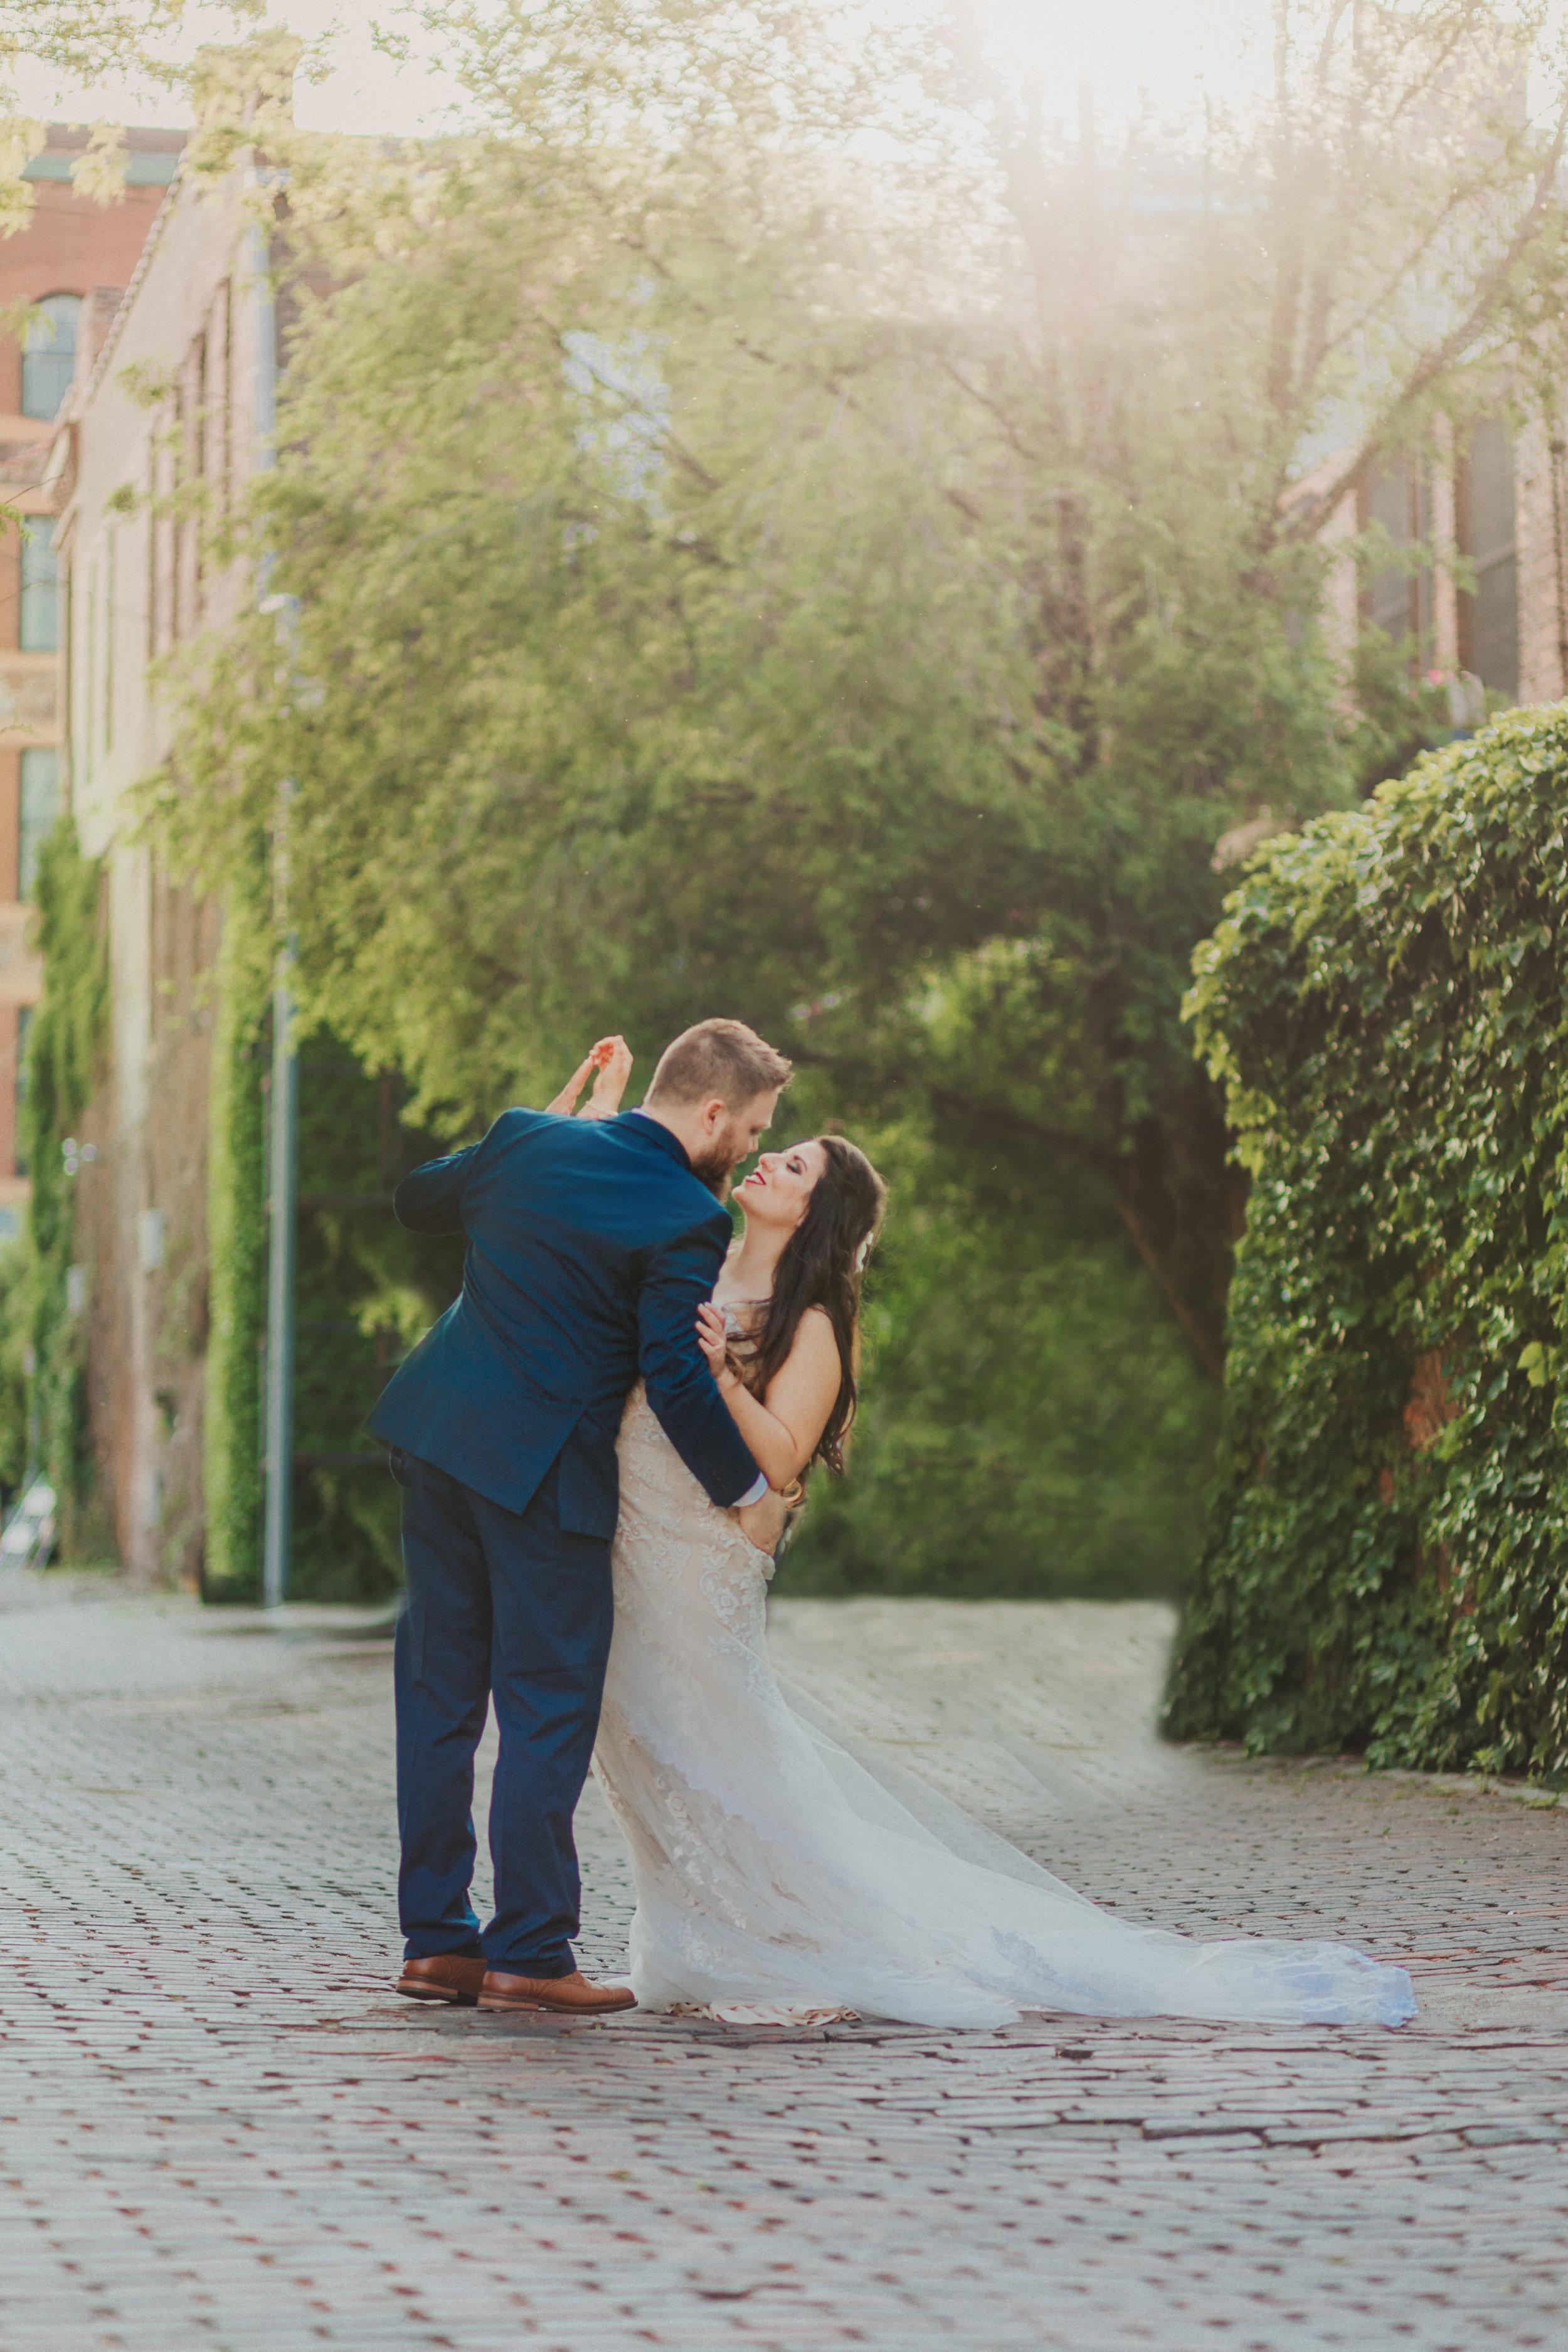 145omaha-old-market-intimate-summer-wedding-tiny-luxe-elopement.jpg